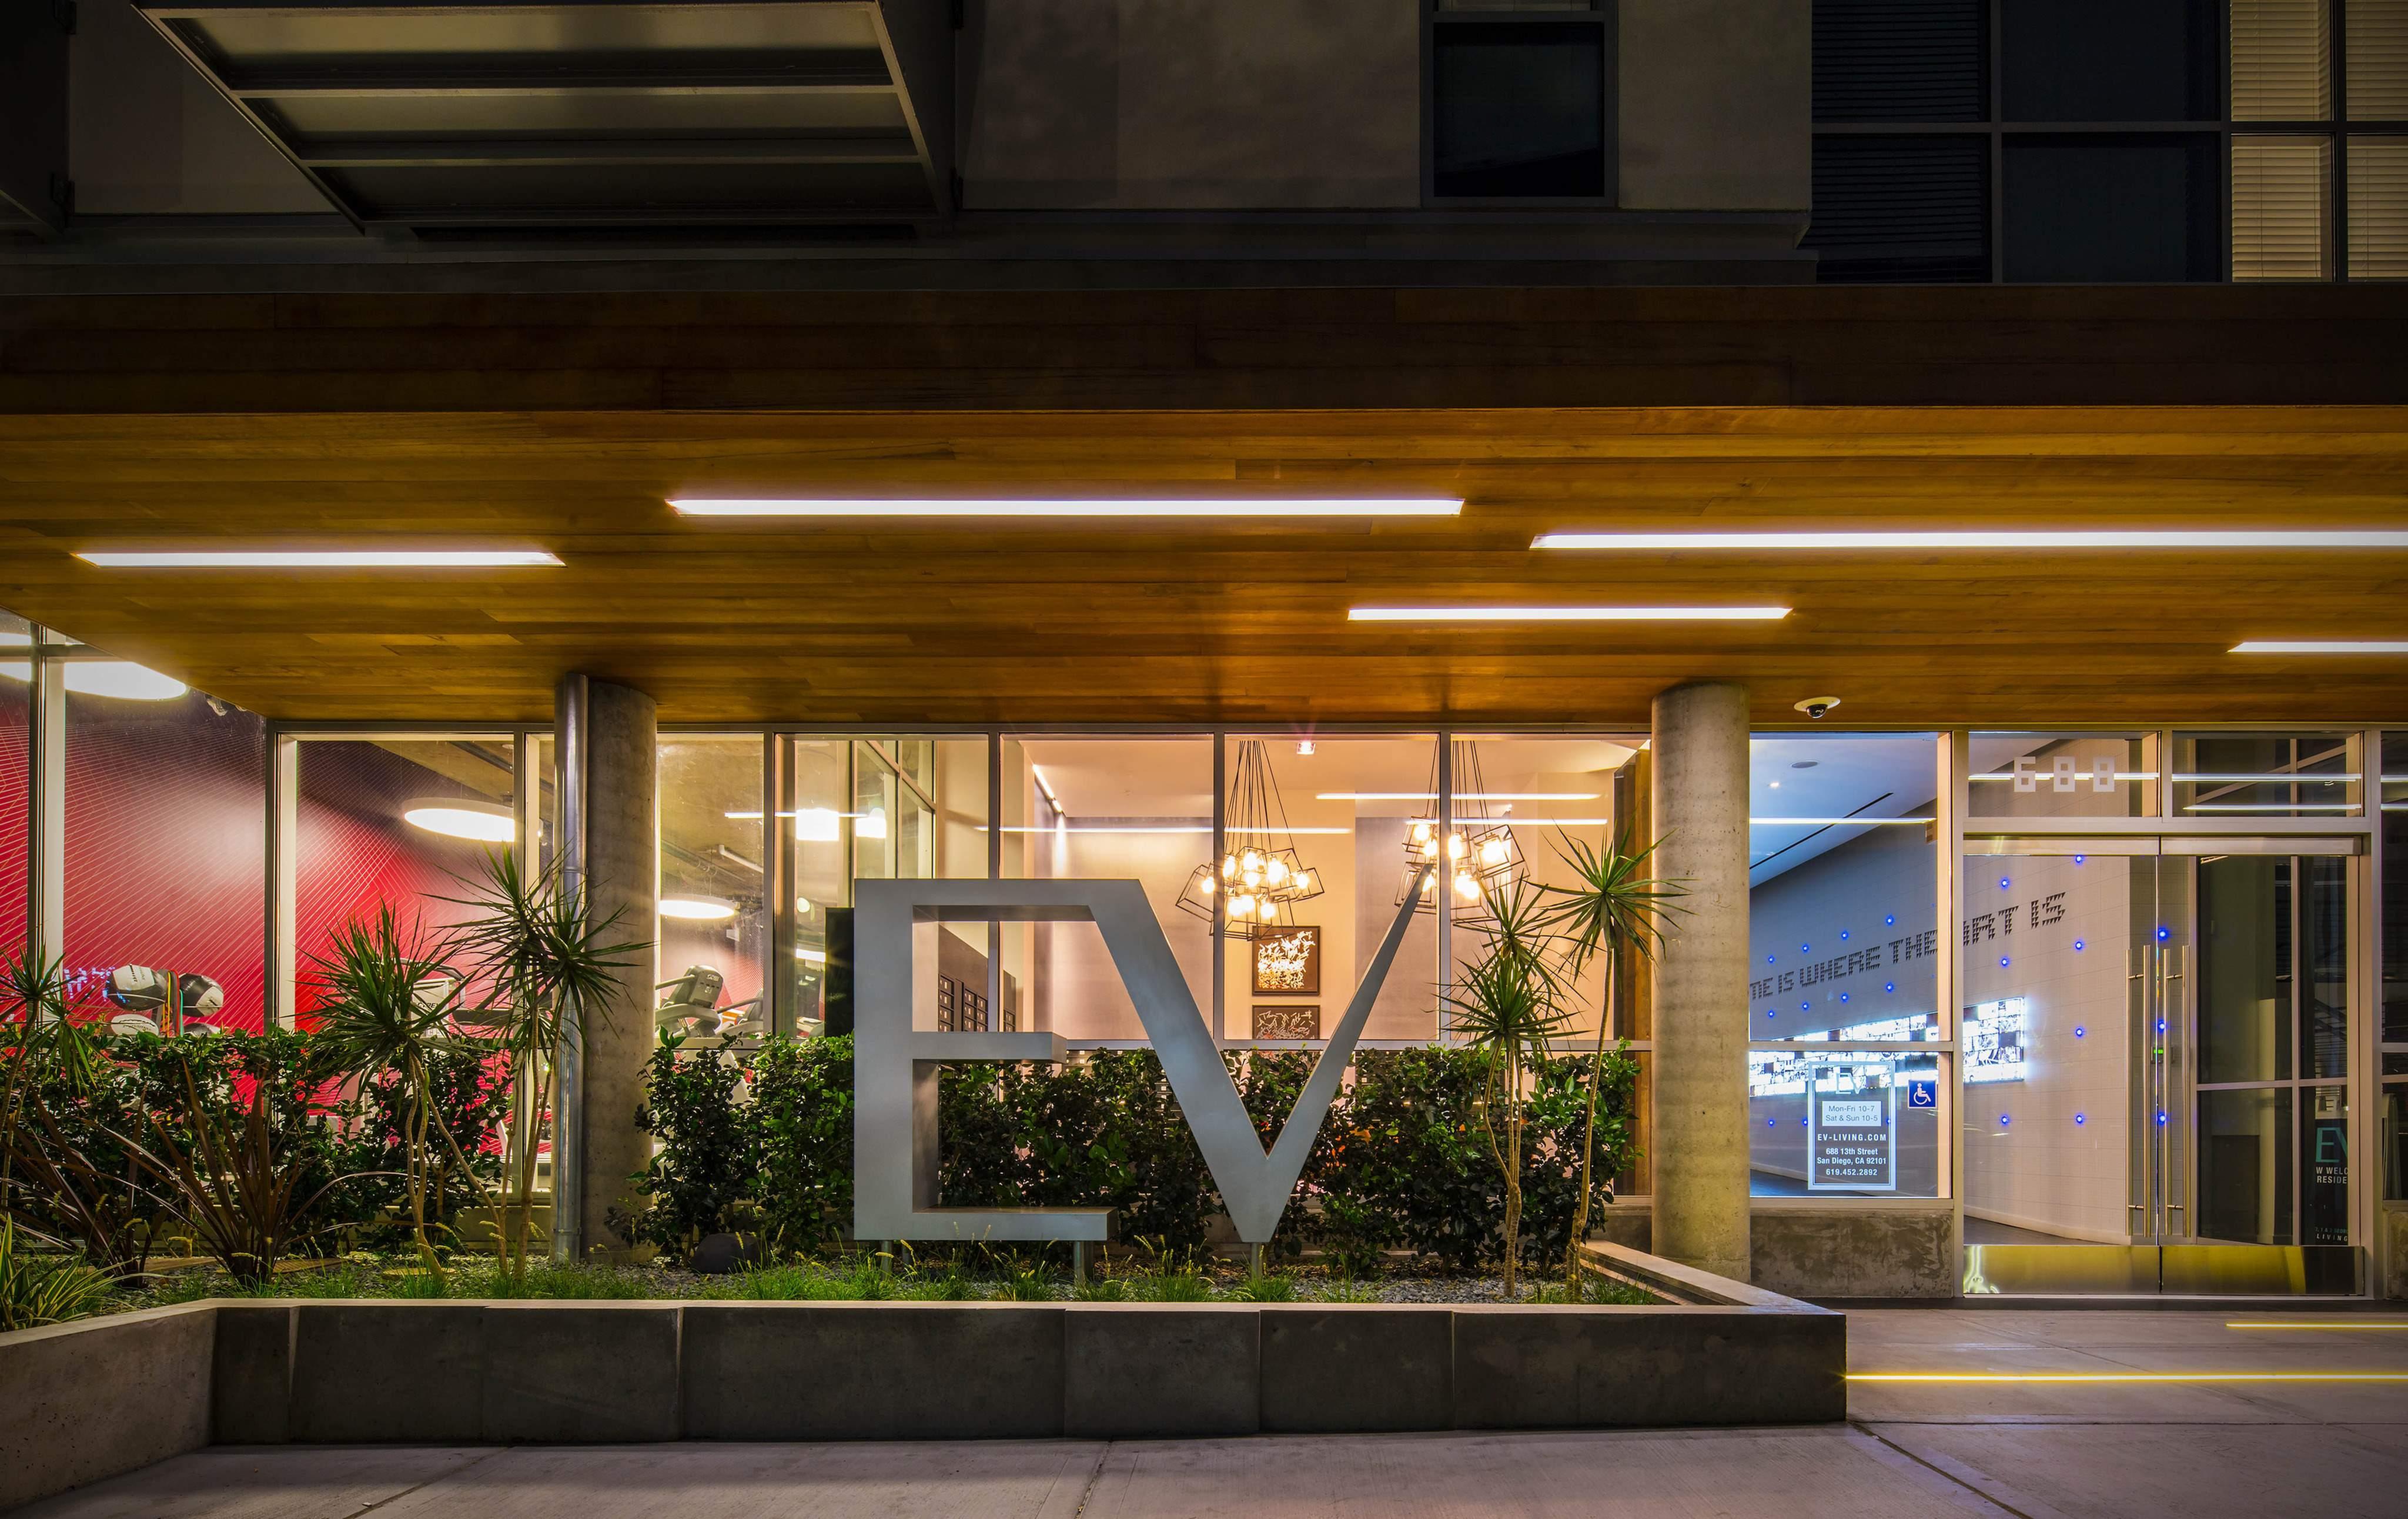 EV Lofts